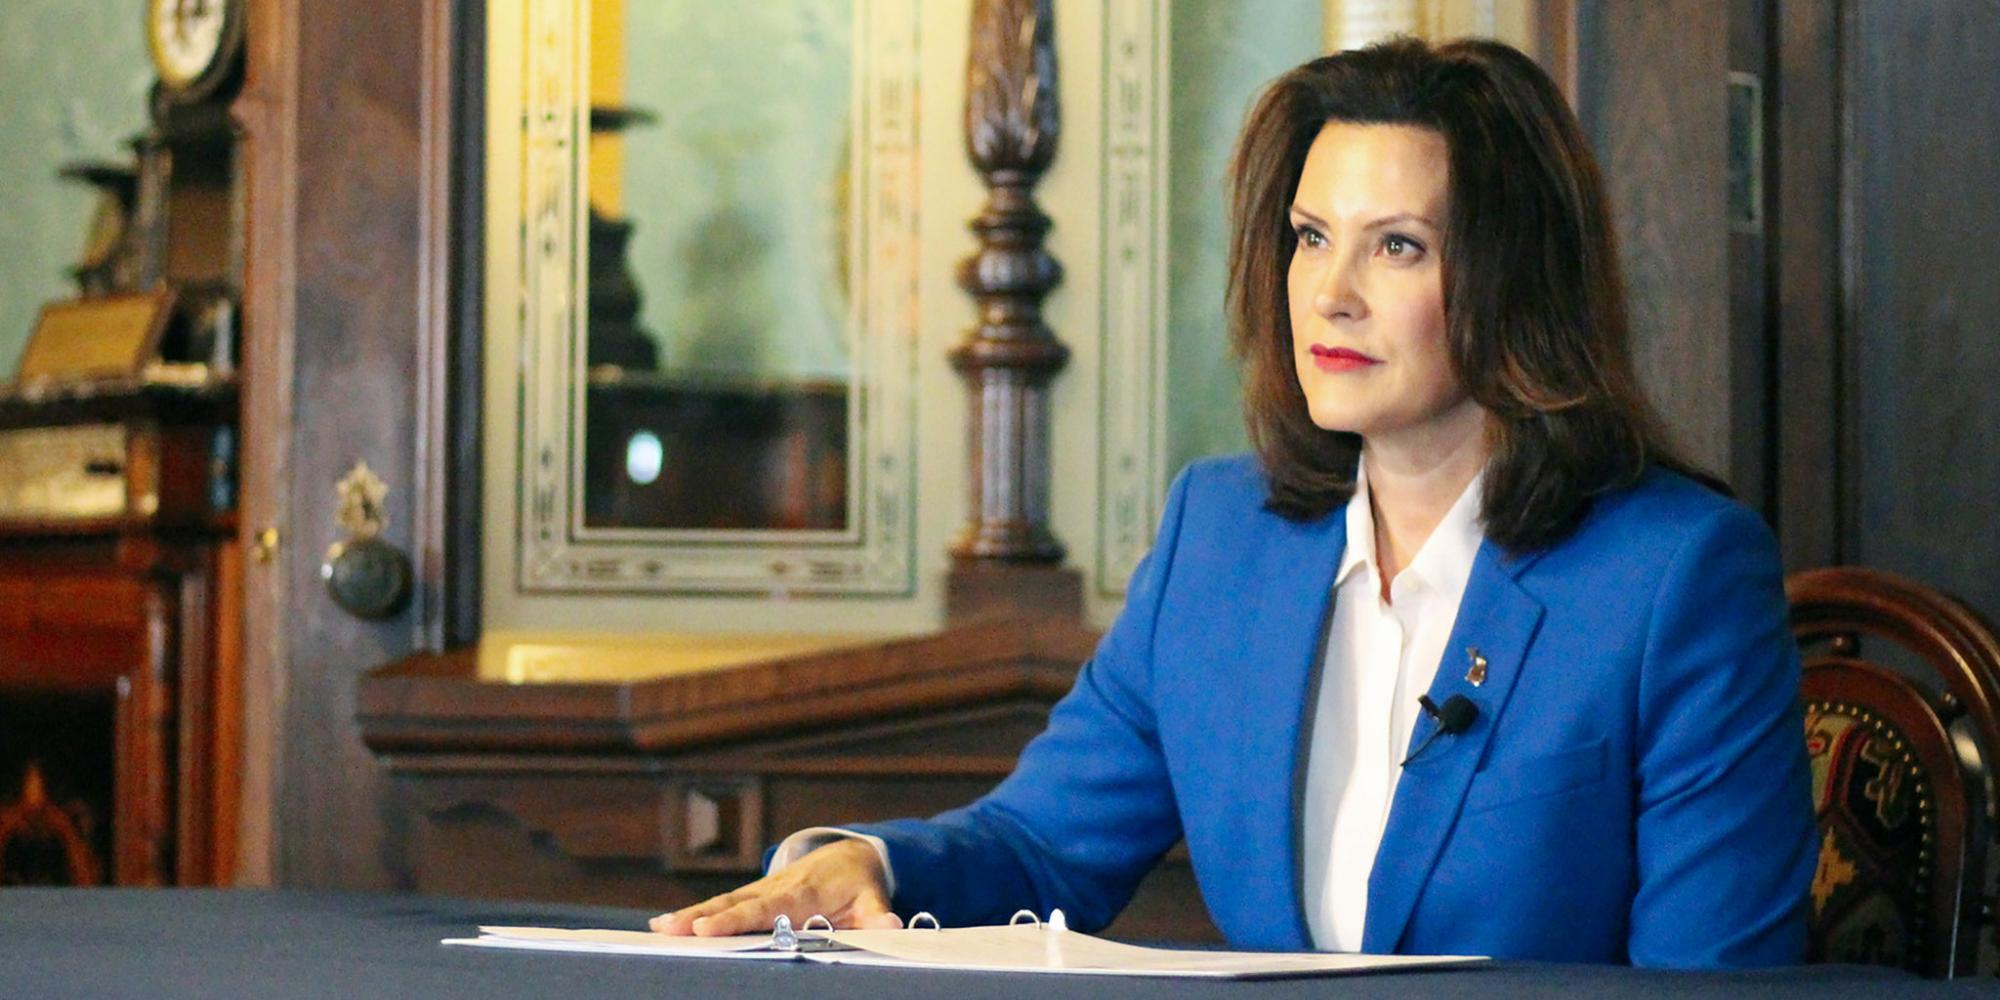 Local Politics 101: The Role of a Governor